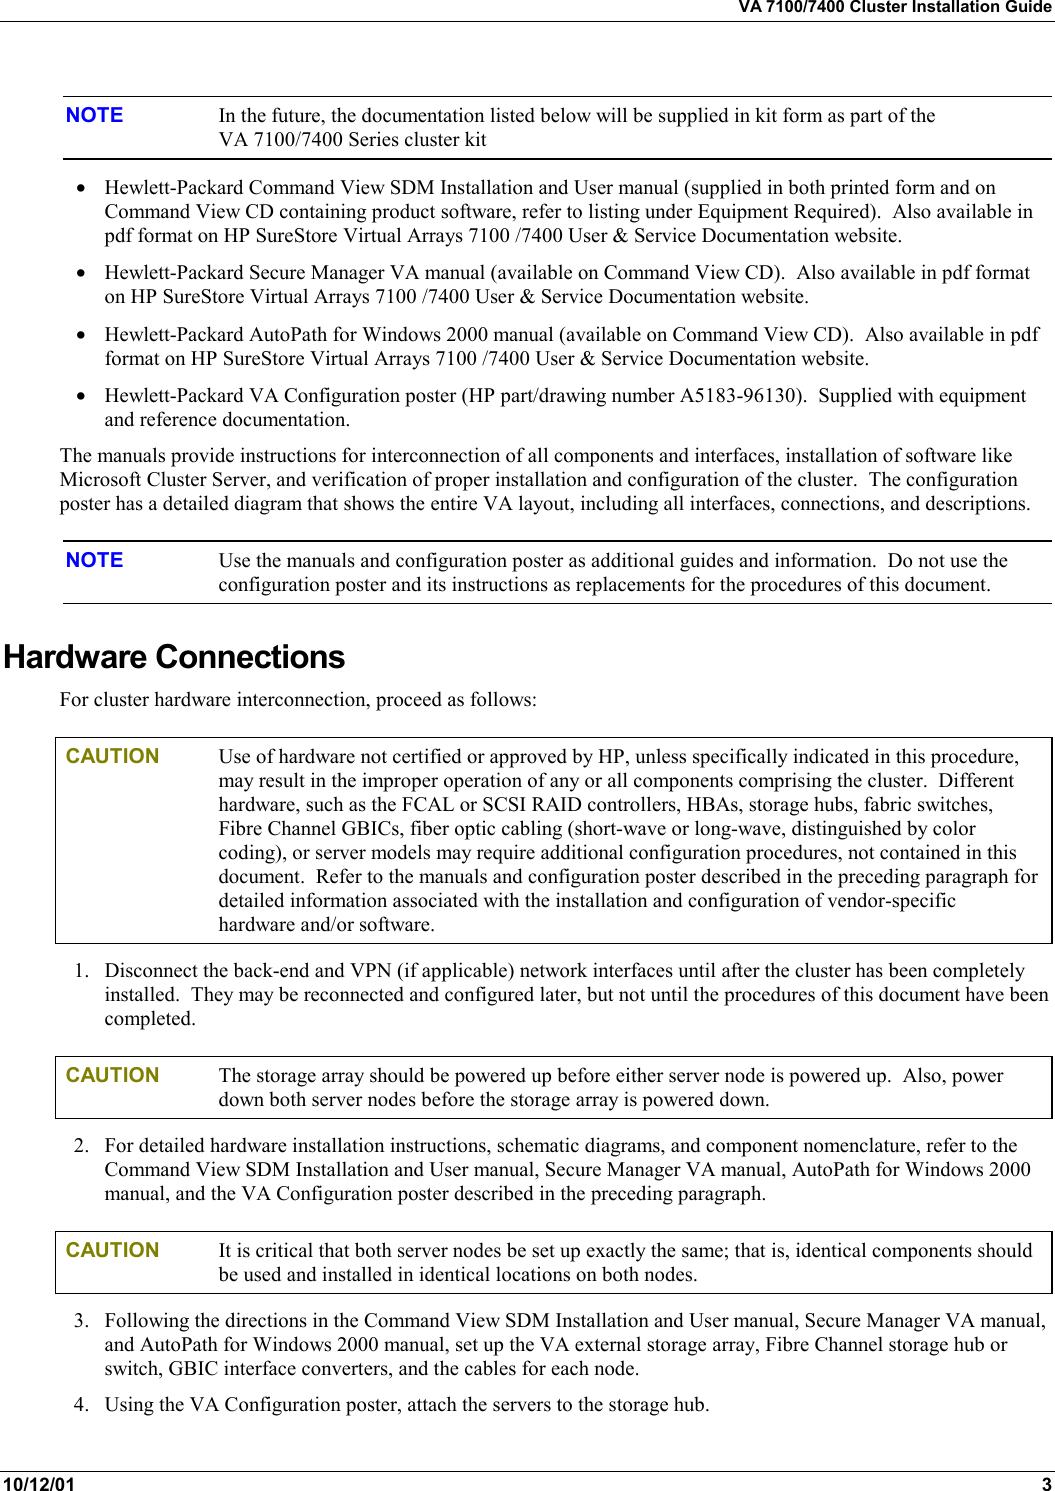 Hp Va 7100 Users Manual Cluster 1 Hewlett Packard FC60